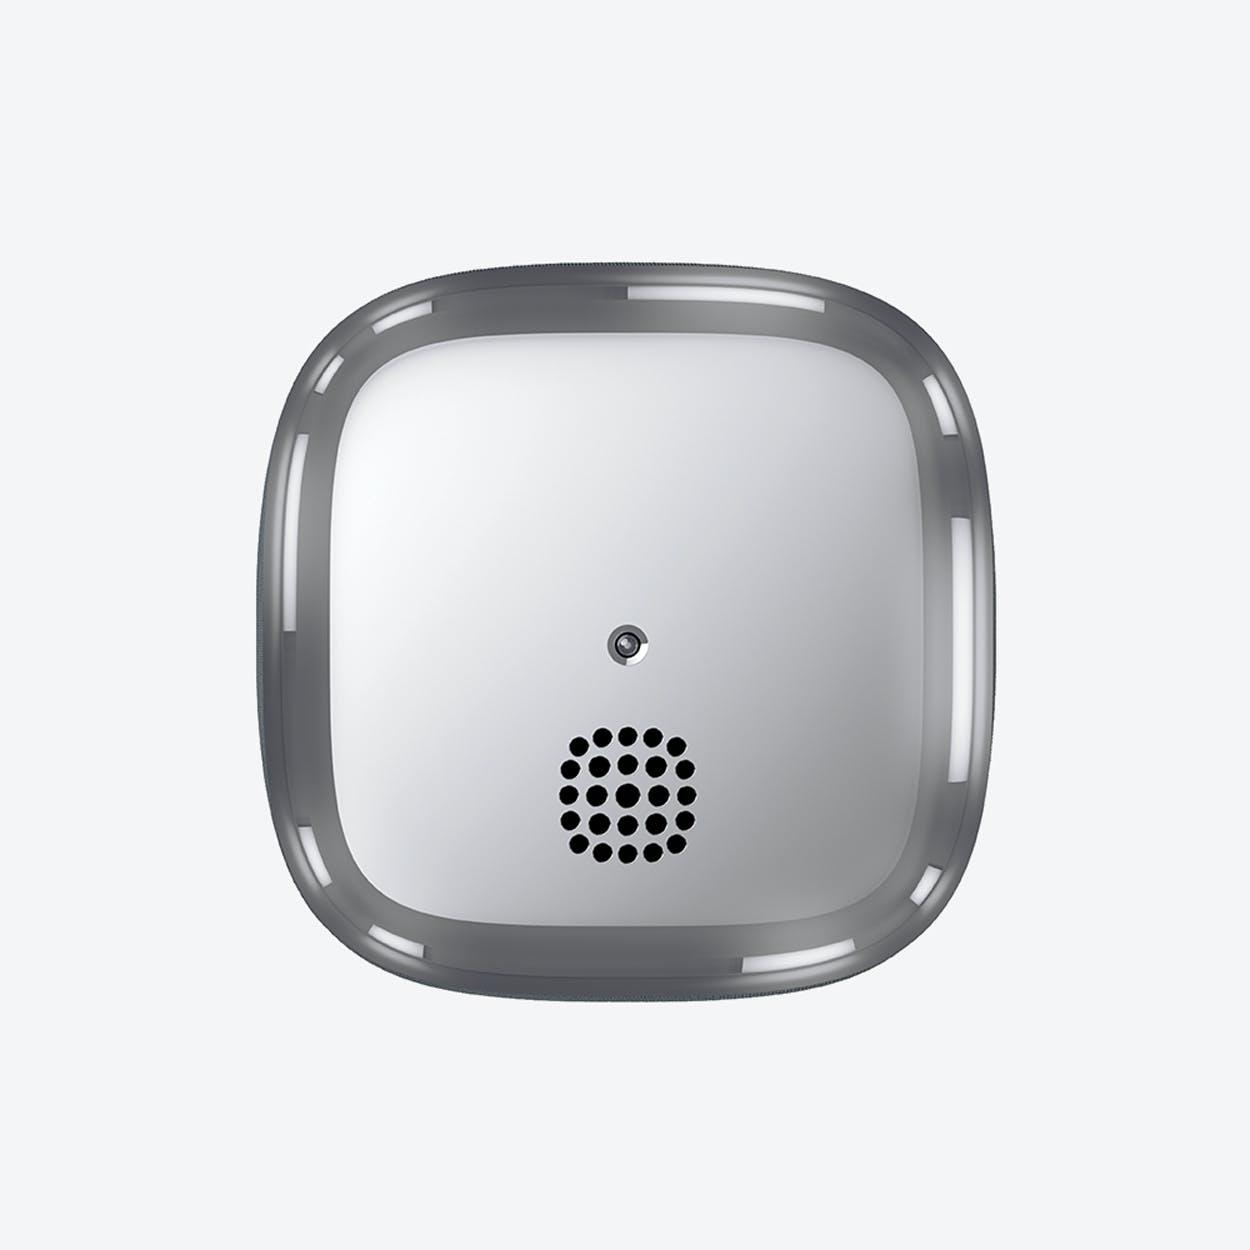 KUPU 10 Smoke Alarm in Chrome